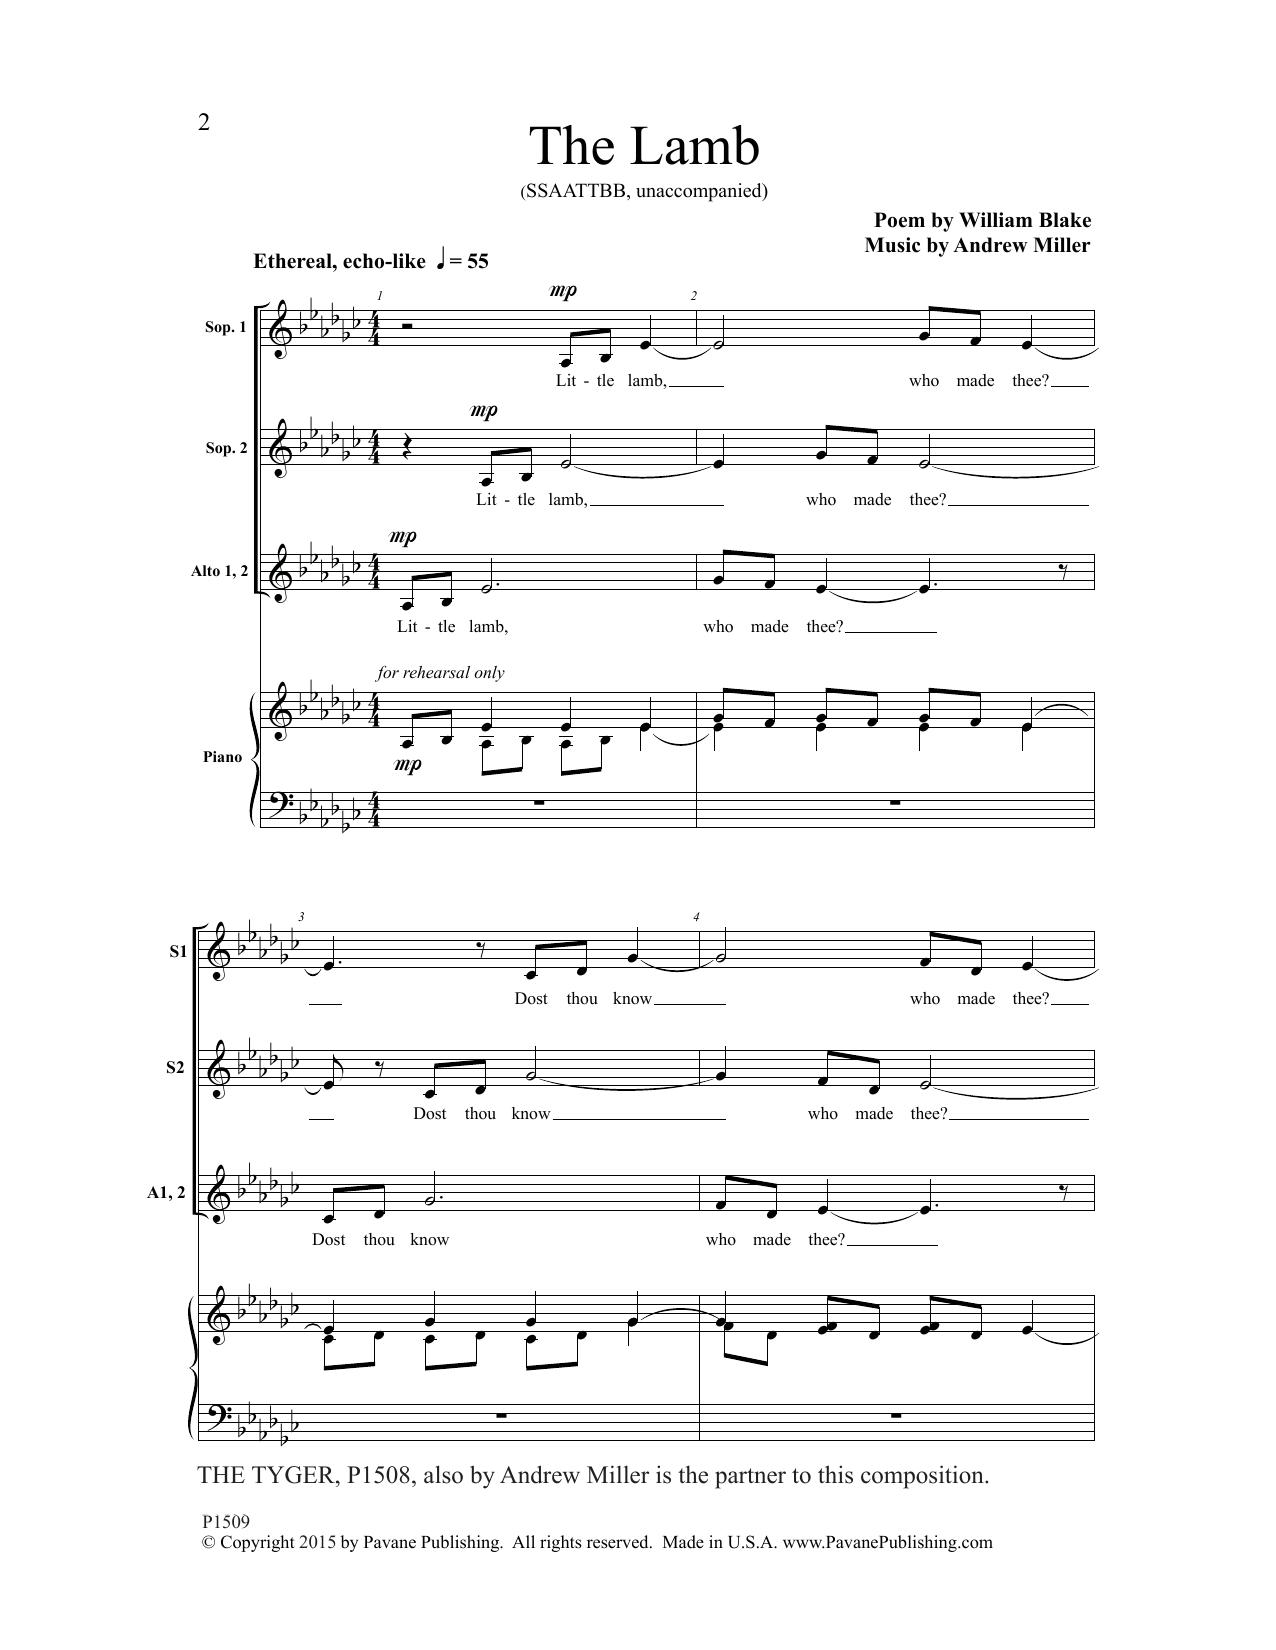 The Lamb Sheet Music